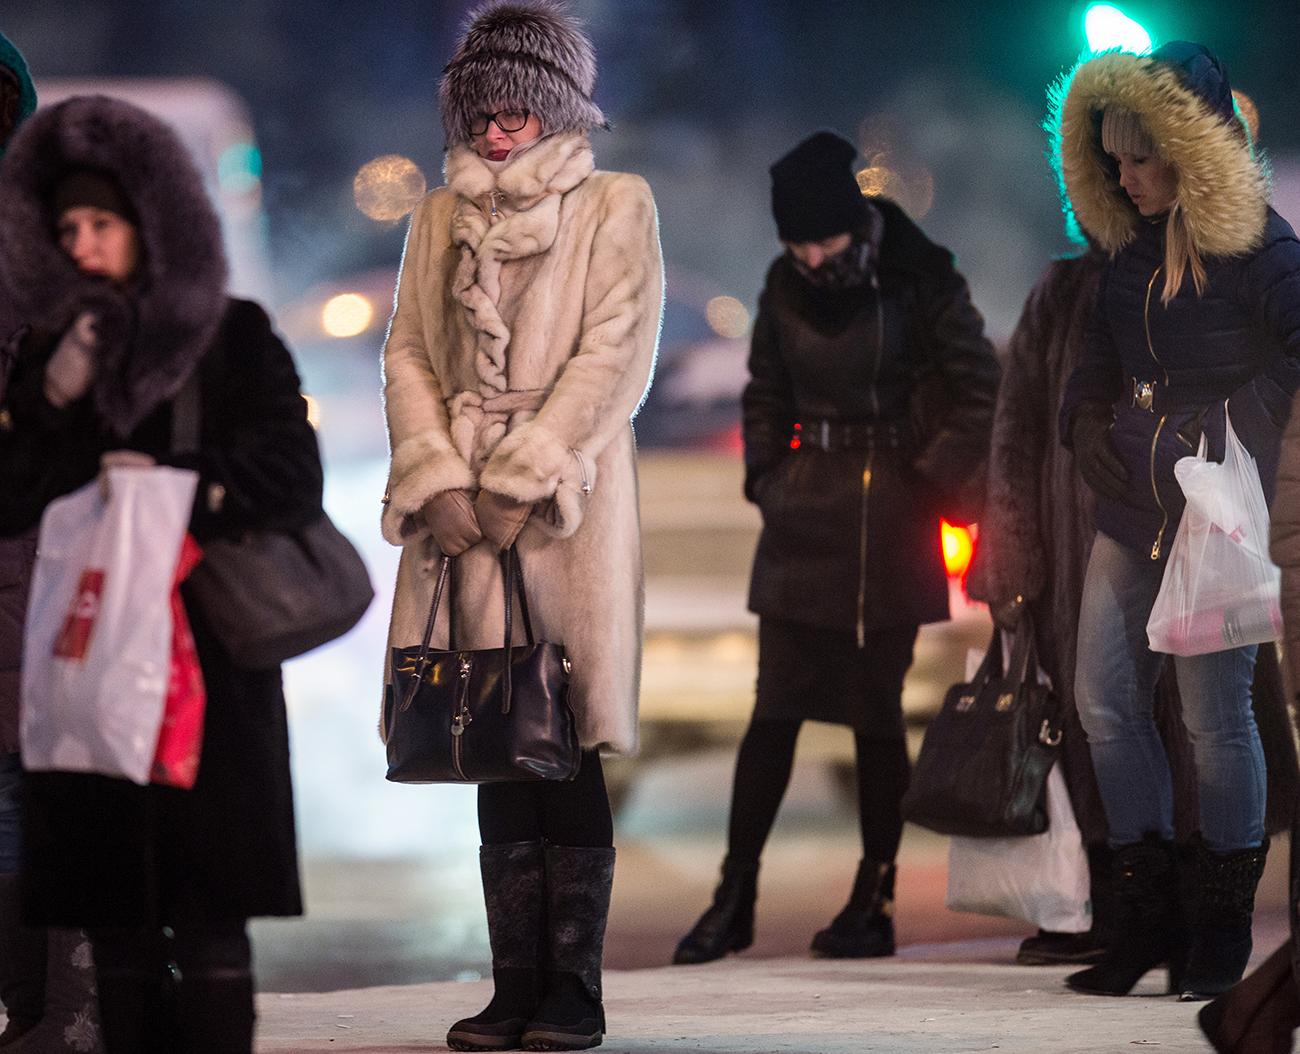 Locals during extremely cold weather in Omsk. / Photo: Alexey Malgavko/RIA Novosti